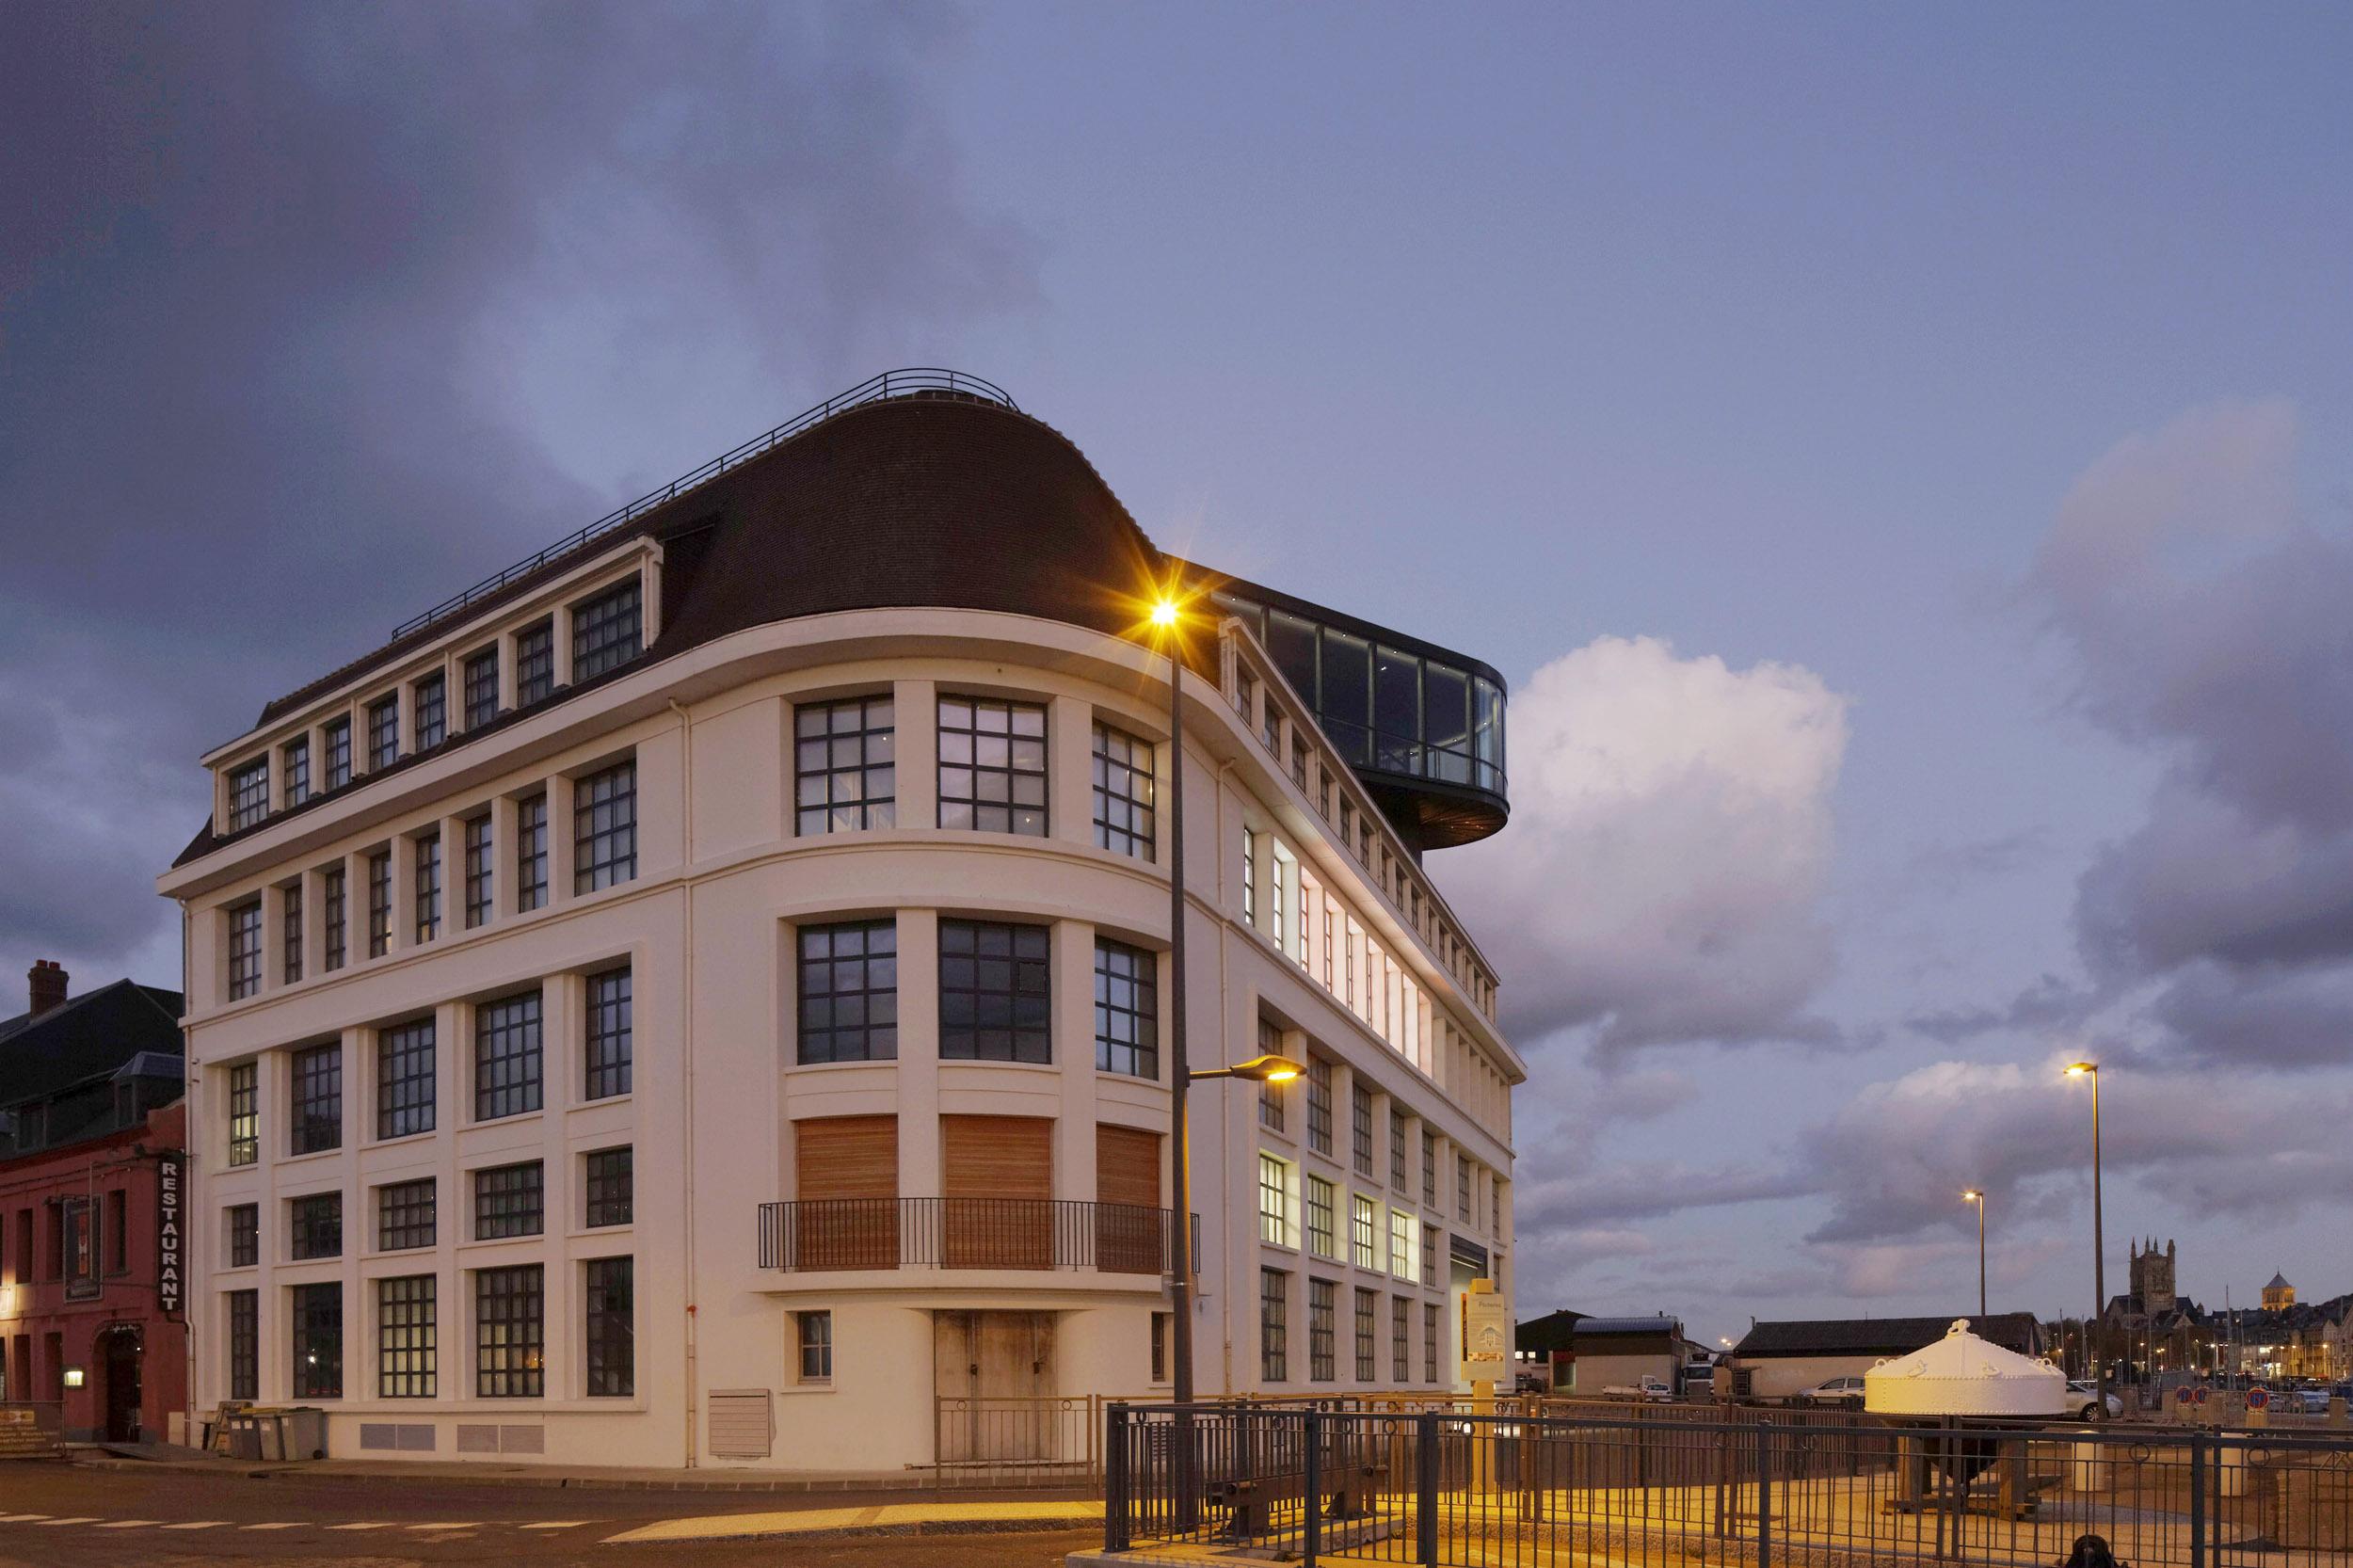 BASALT ARCHITECTURE | MUSEE DES PECHERIES FECAMP